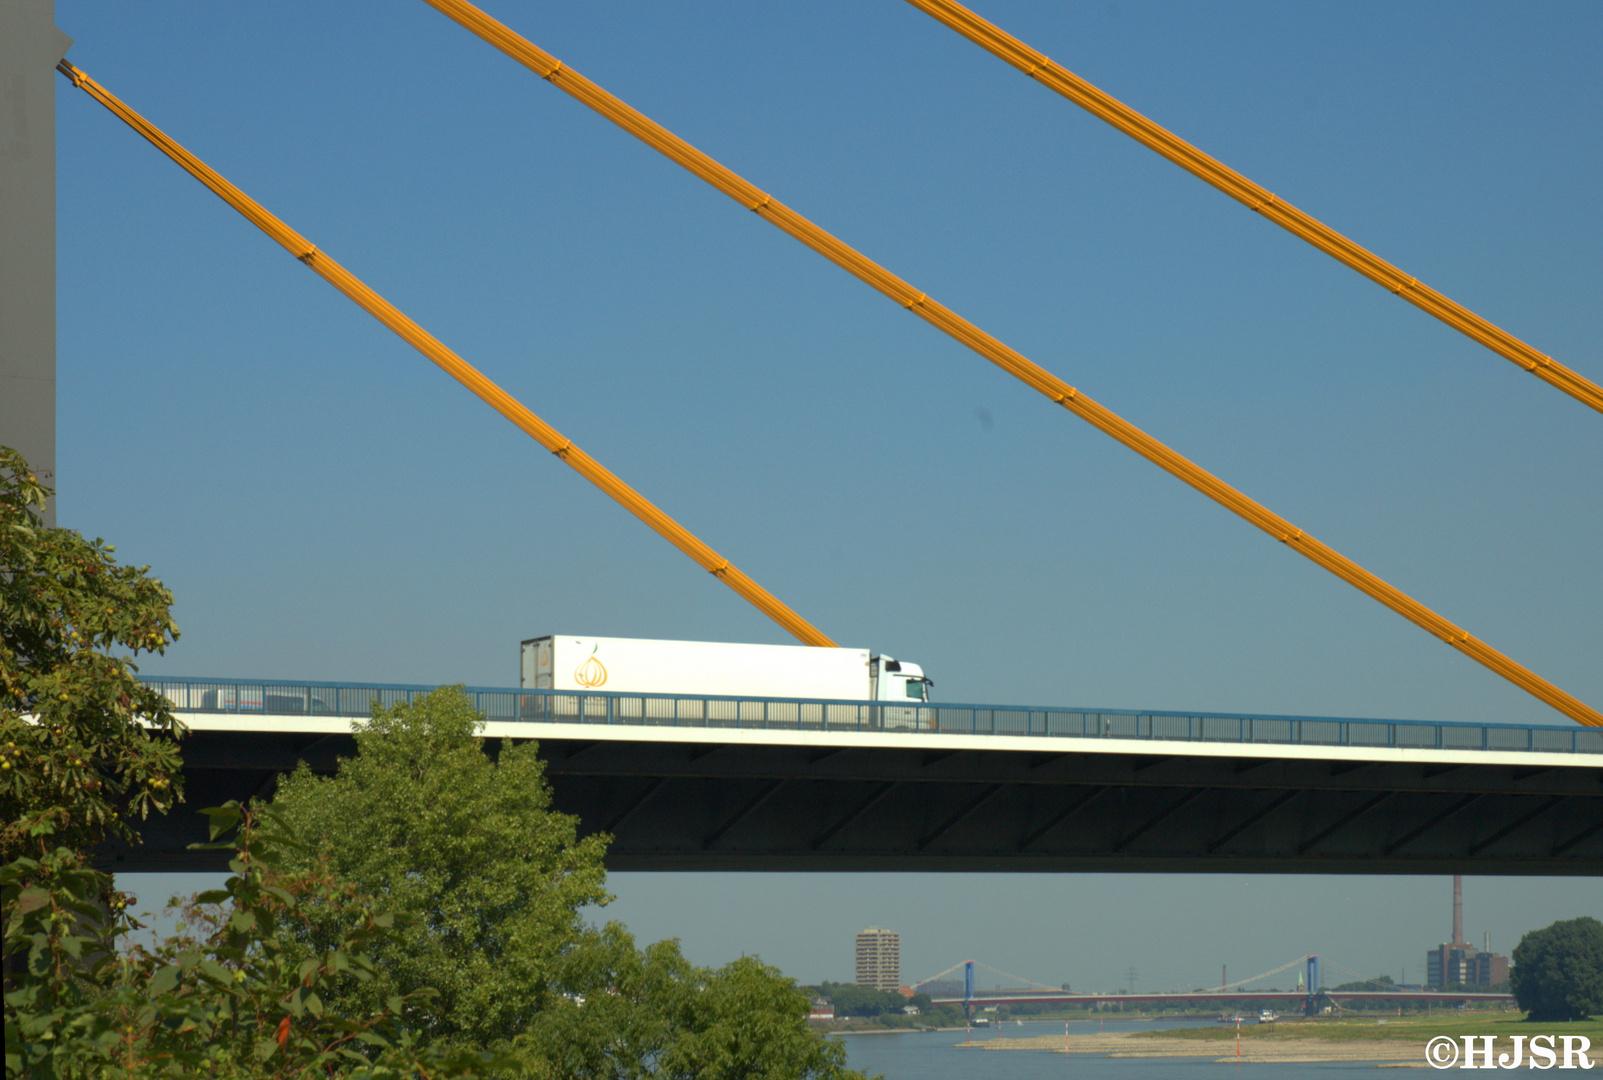 Rheinbrücke Duisburg Neuenkamp (A40)